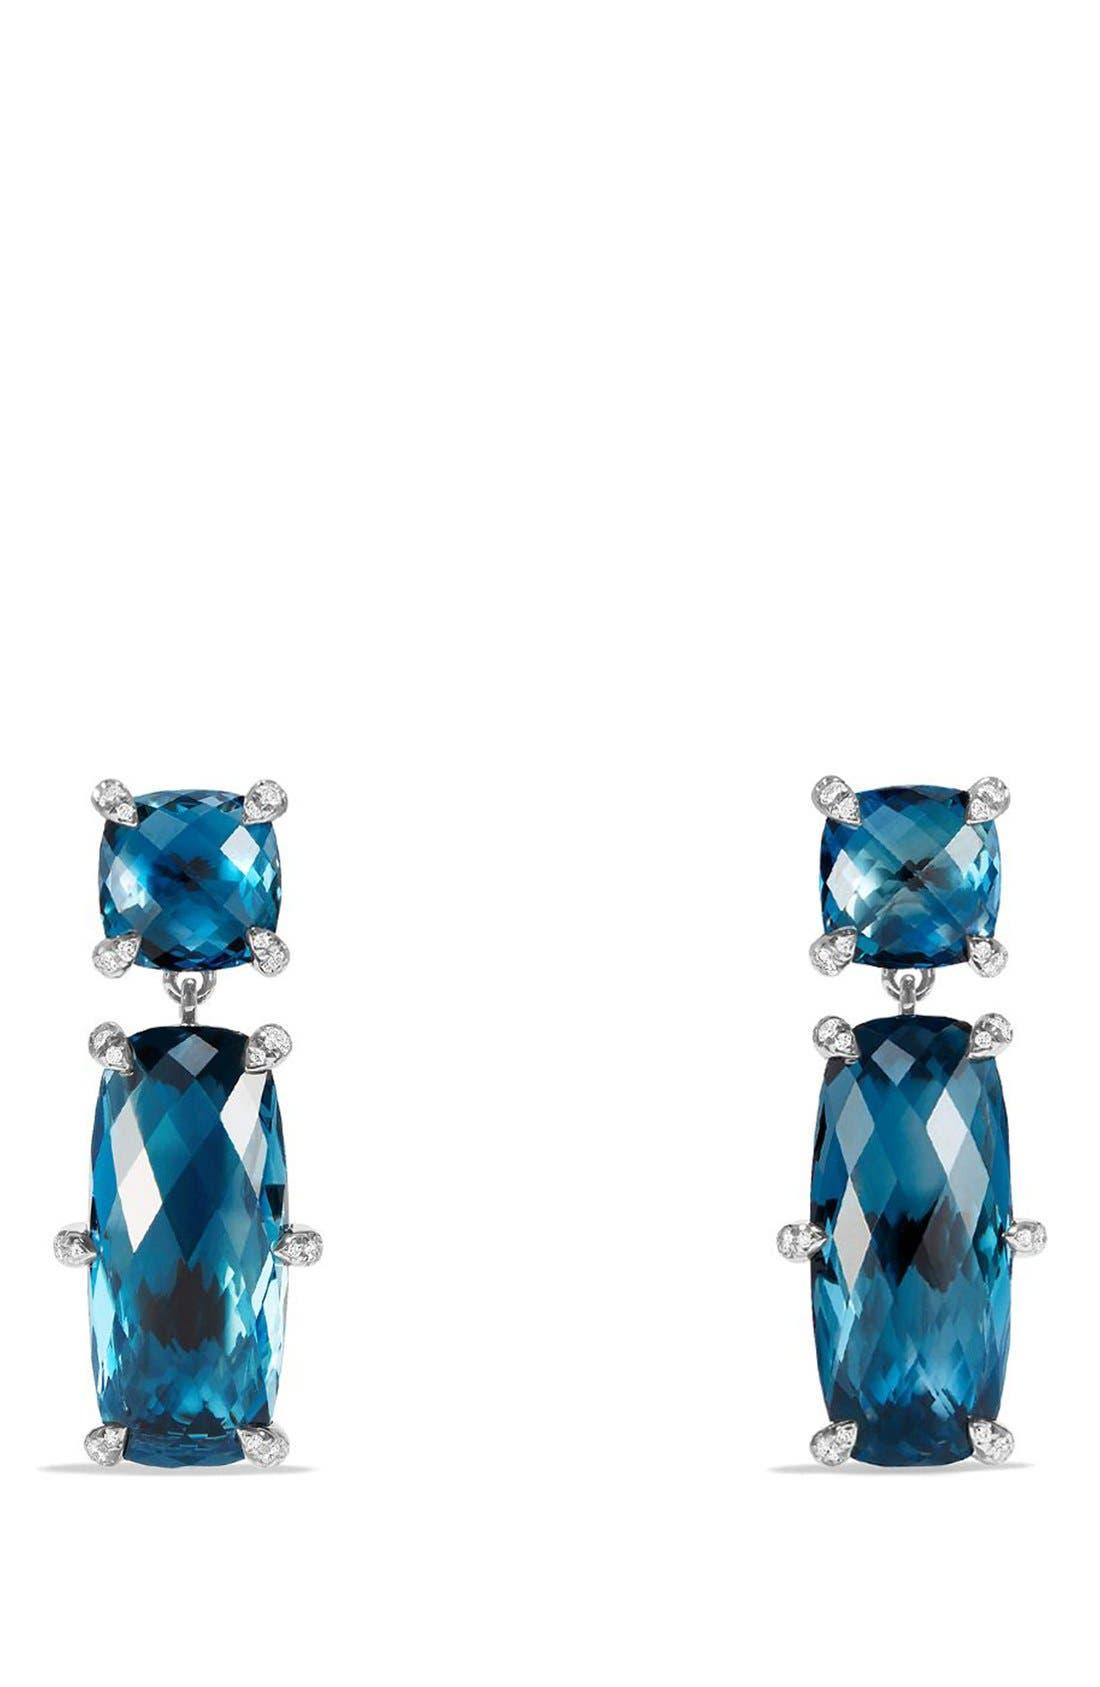 DAVID YURMAN, 'Châtelaine' Double Drop Earrings, Main thumbnail 1, color, SILVER/ HAMPTON BLUE TOPAZ